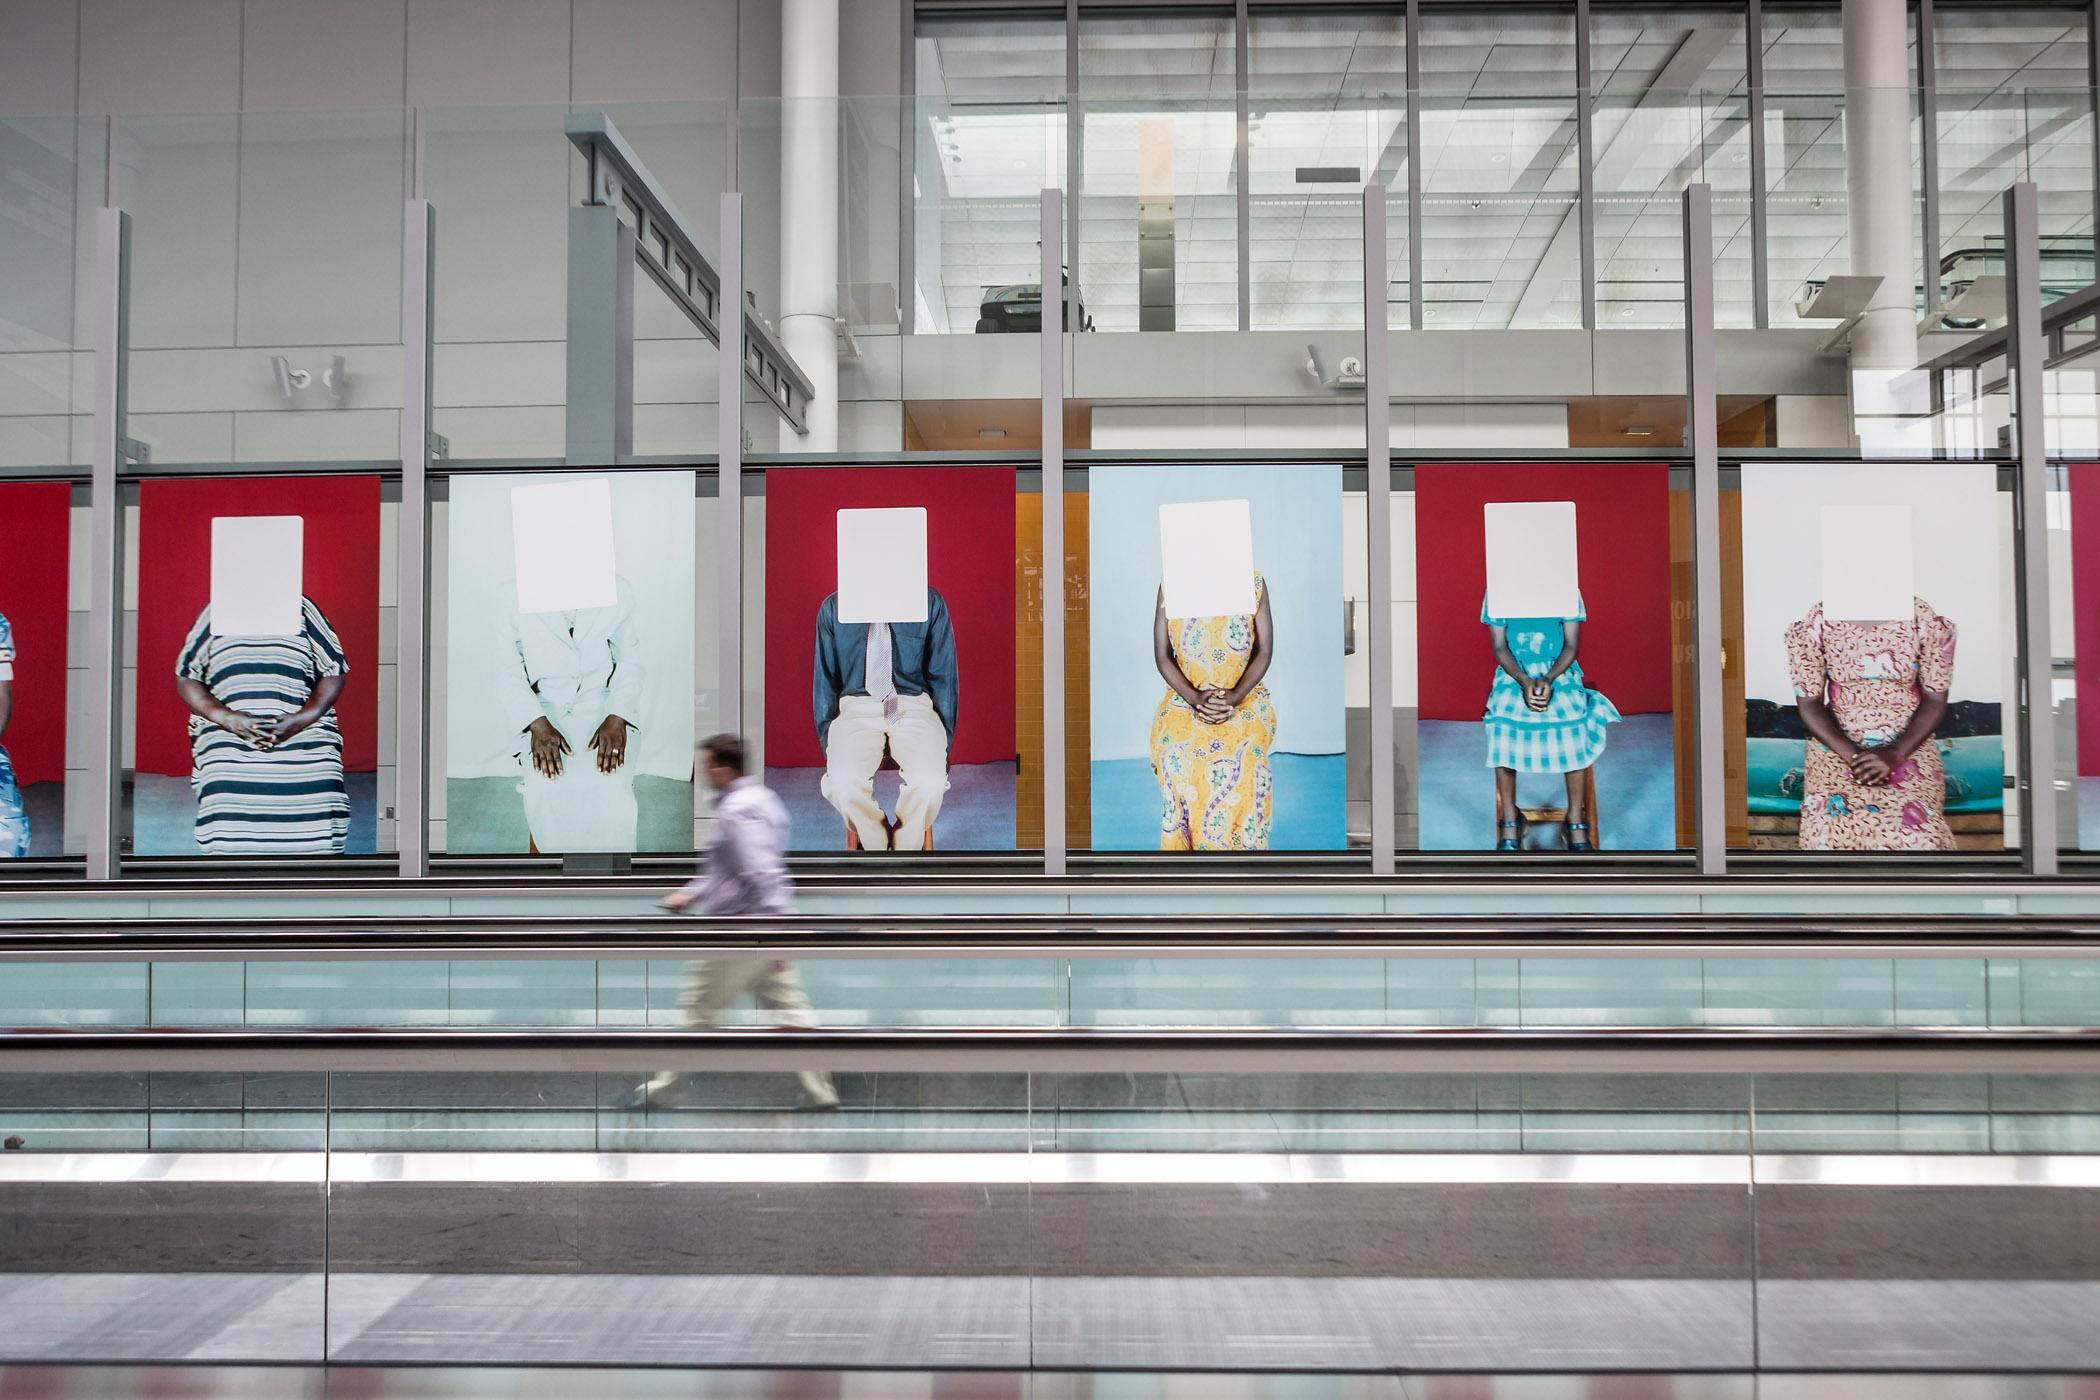 Installation view of Martina Bacigalupo Gulu Real Art Studio at Pearson International Airport, ,  Photo: Toni Hafkenscheid